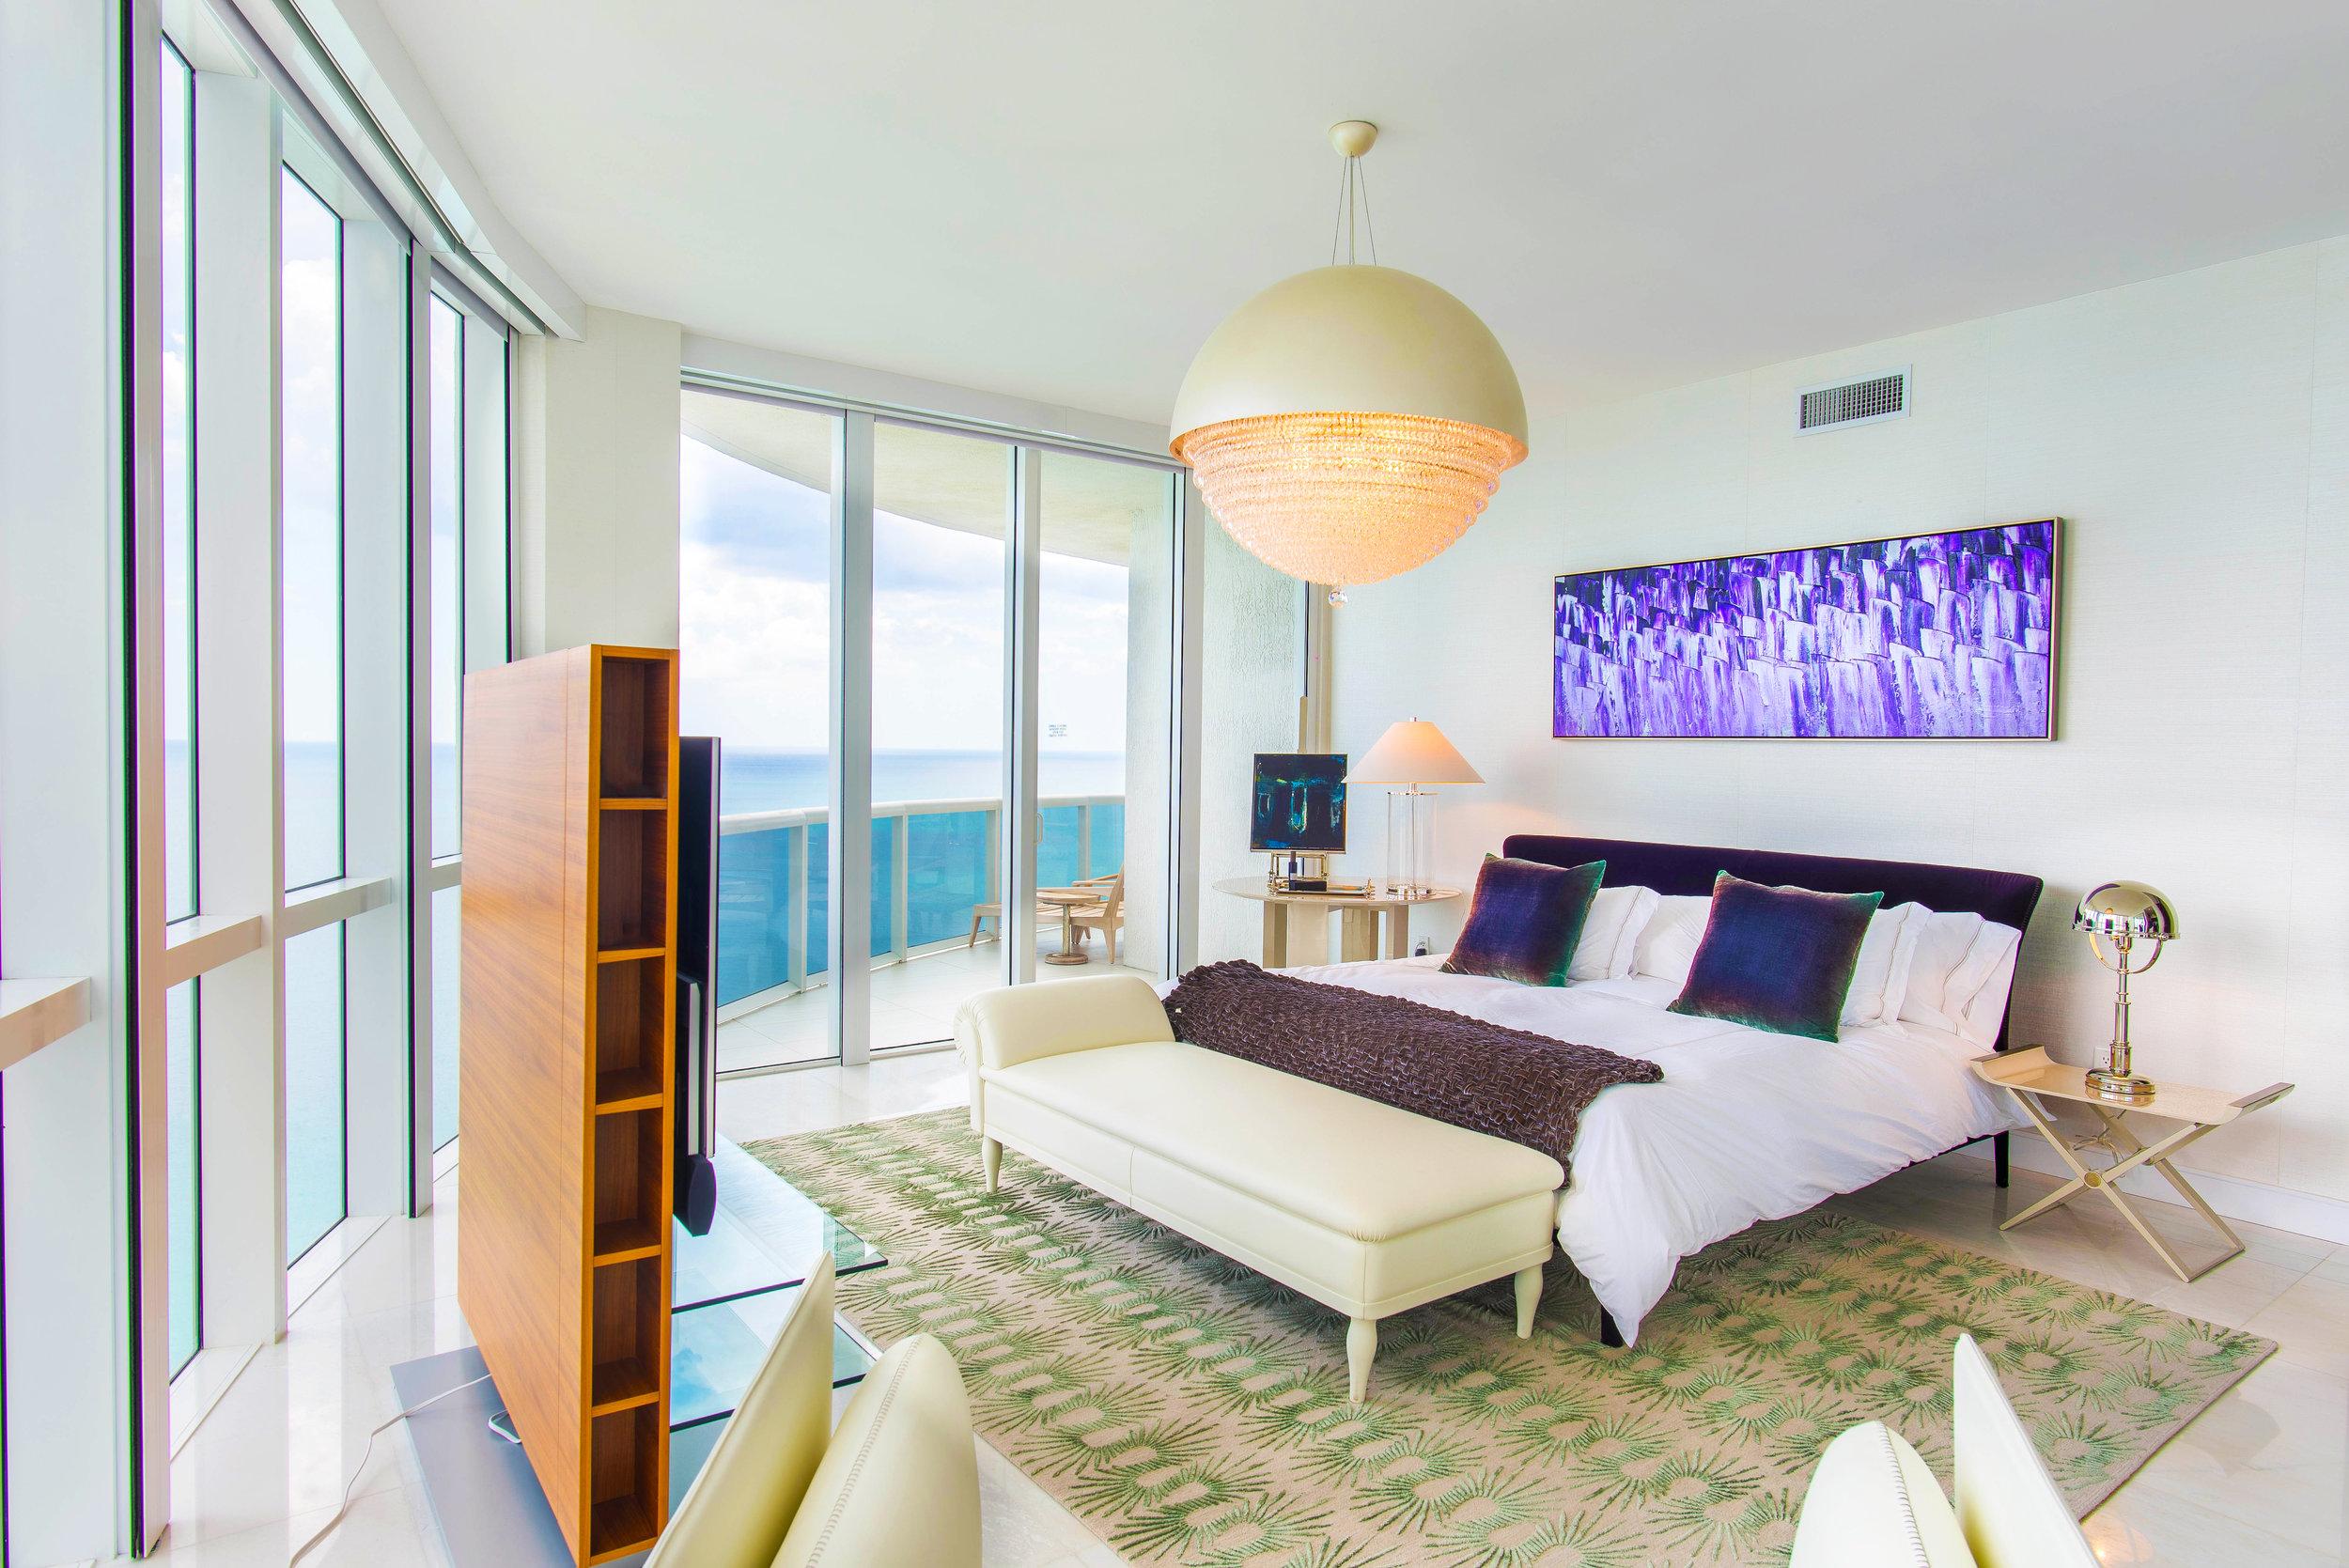 Trump Tower - Sunny Isles Miami - Real Estate